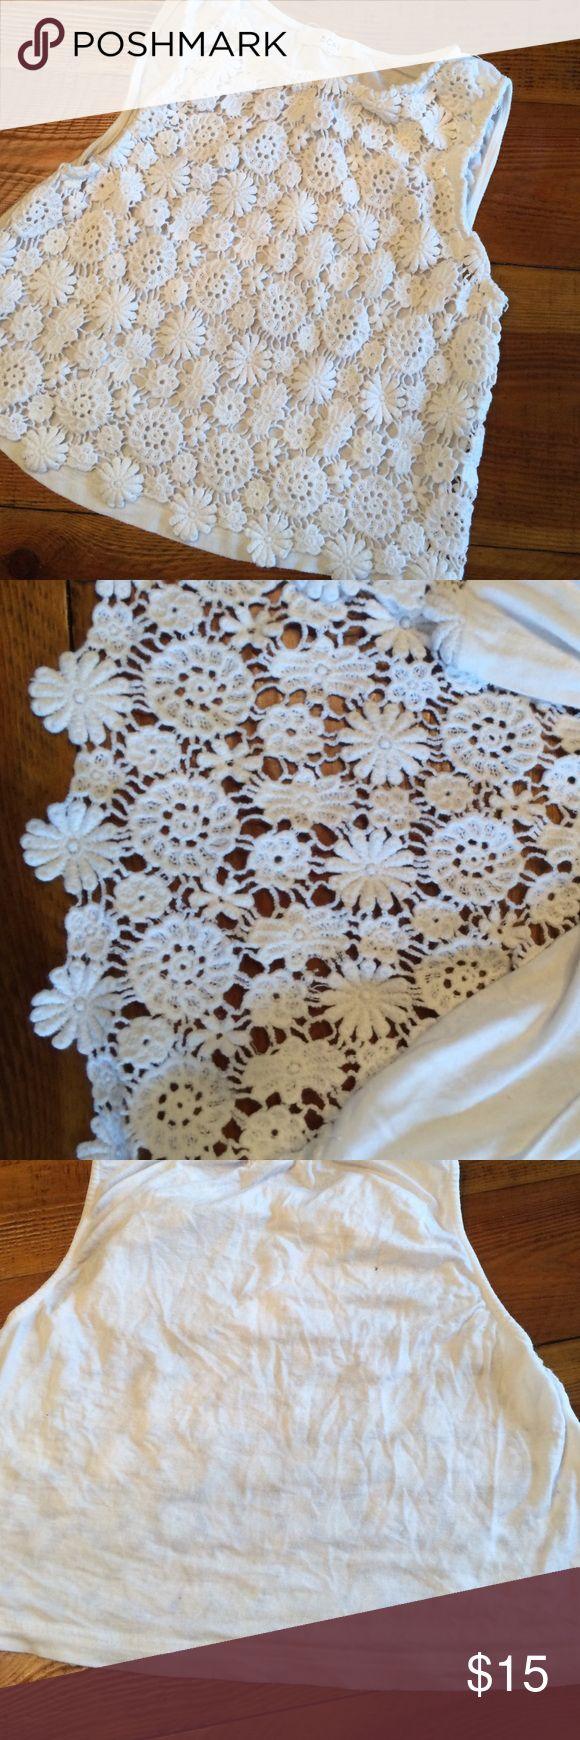 Crochet Lace Front Crop Top Crochet Lace Front Crop Top soli back. Super cute over bralettes or bikini tops BCNU Tops Crop Tops